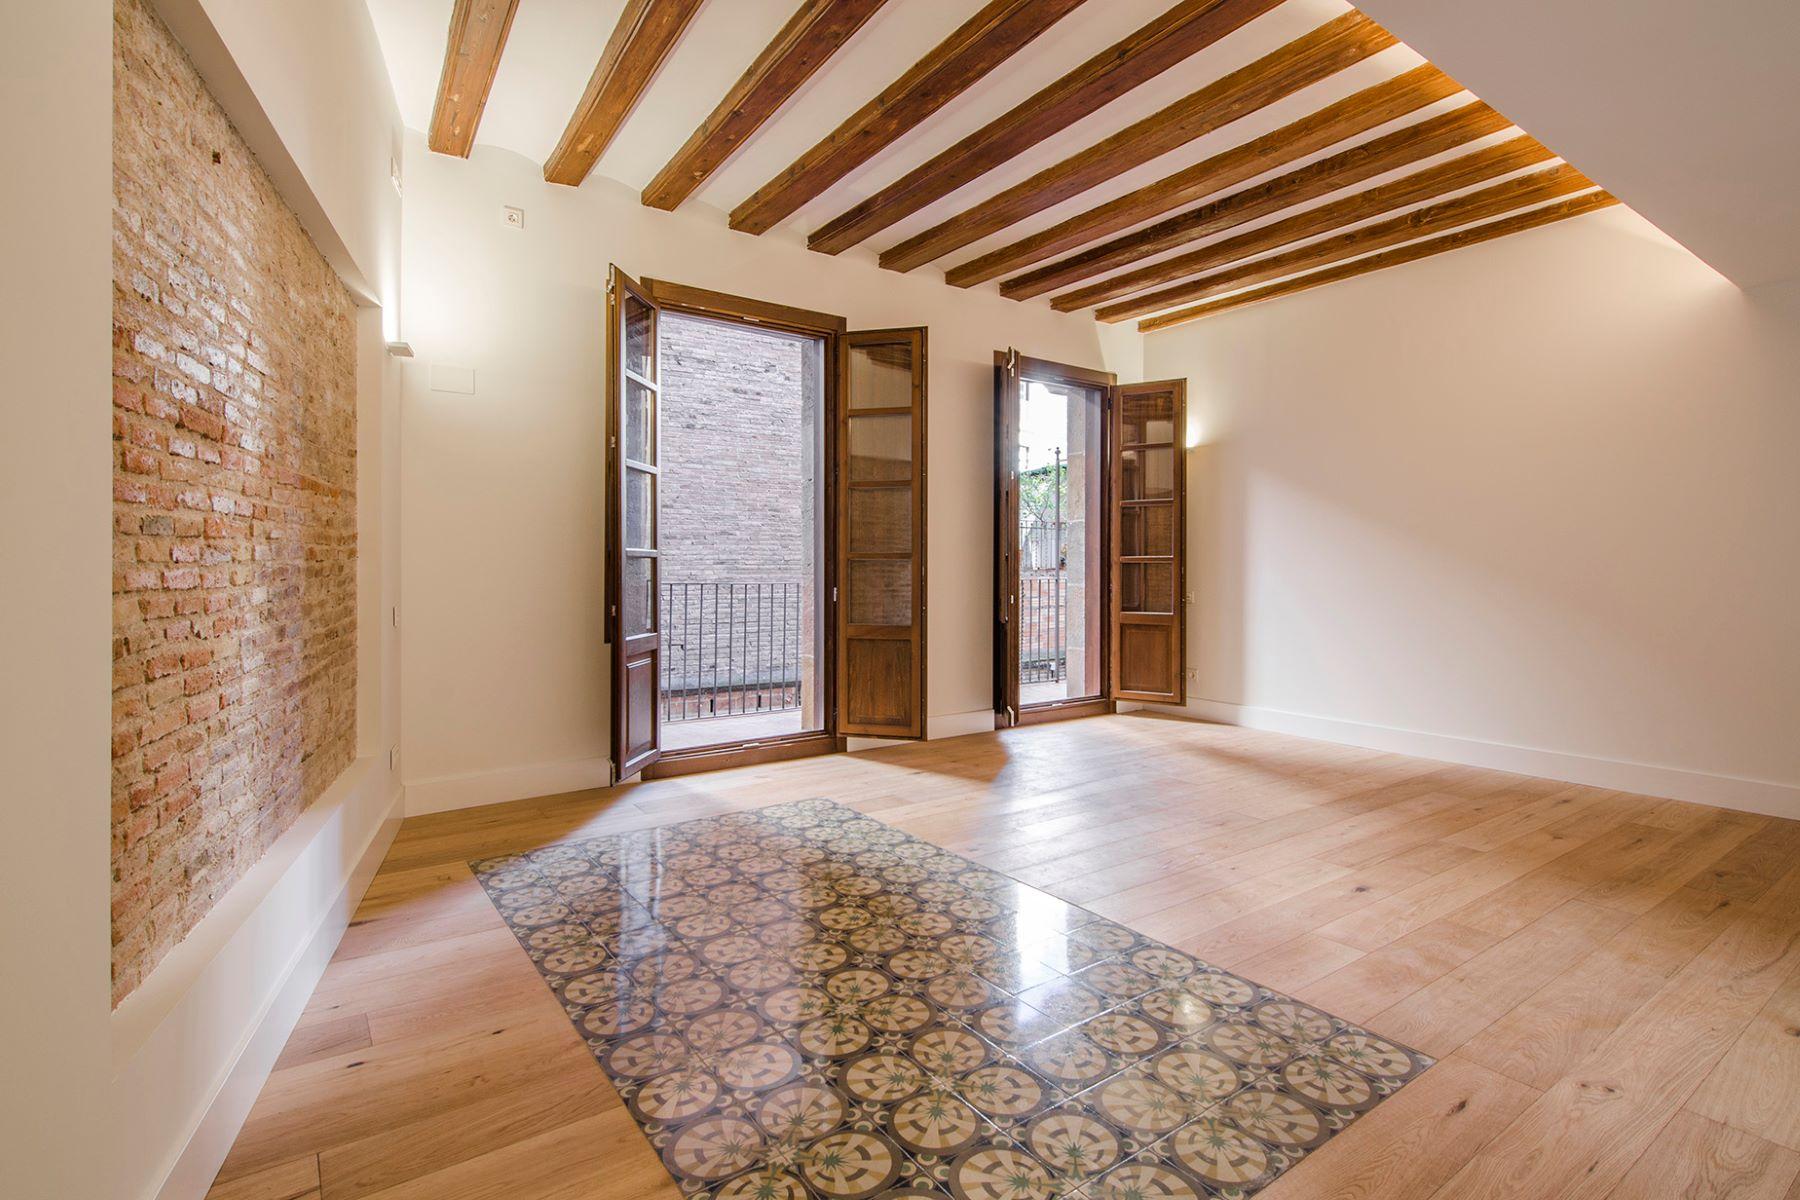 Apartamento por un Venta en Penthouse Duplex with 3 Bedrooms with exclusive terrace Barcelona City, Barcelona, 08002 España